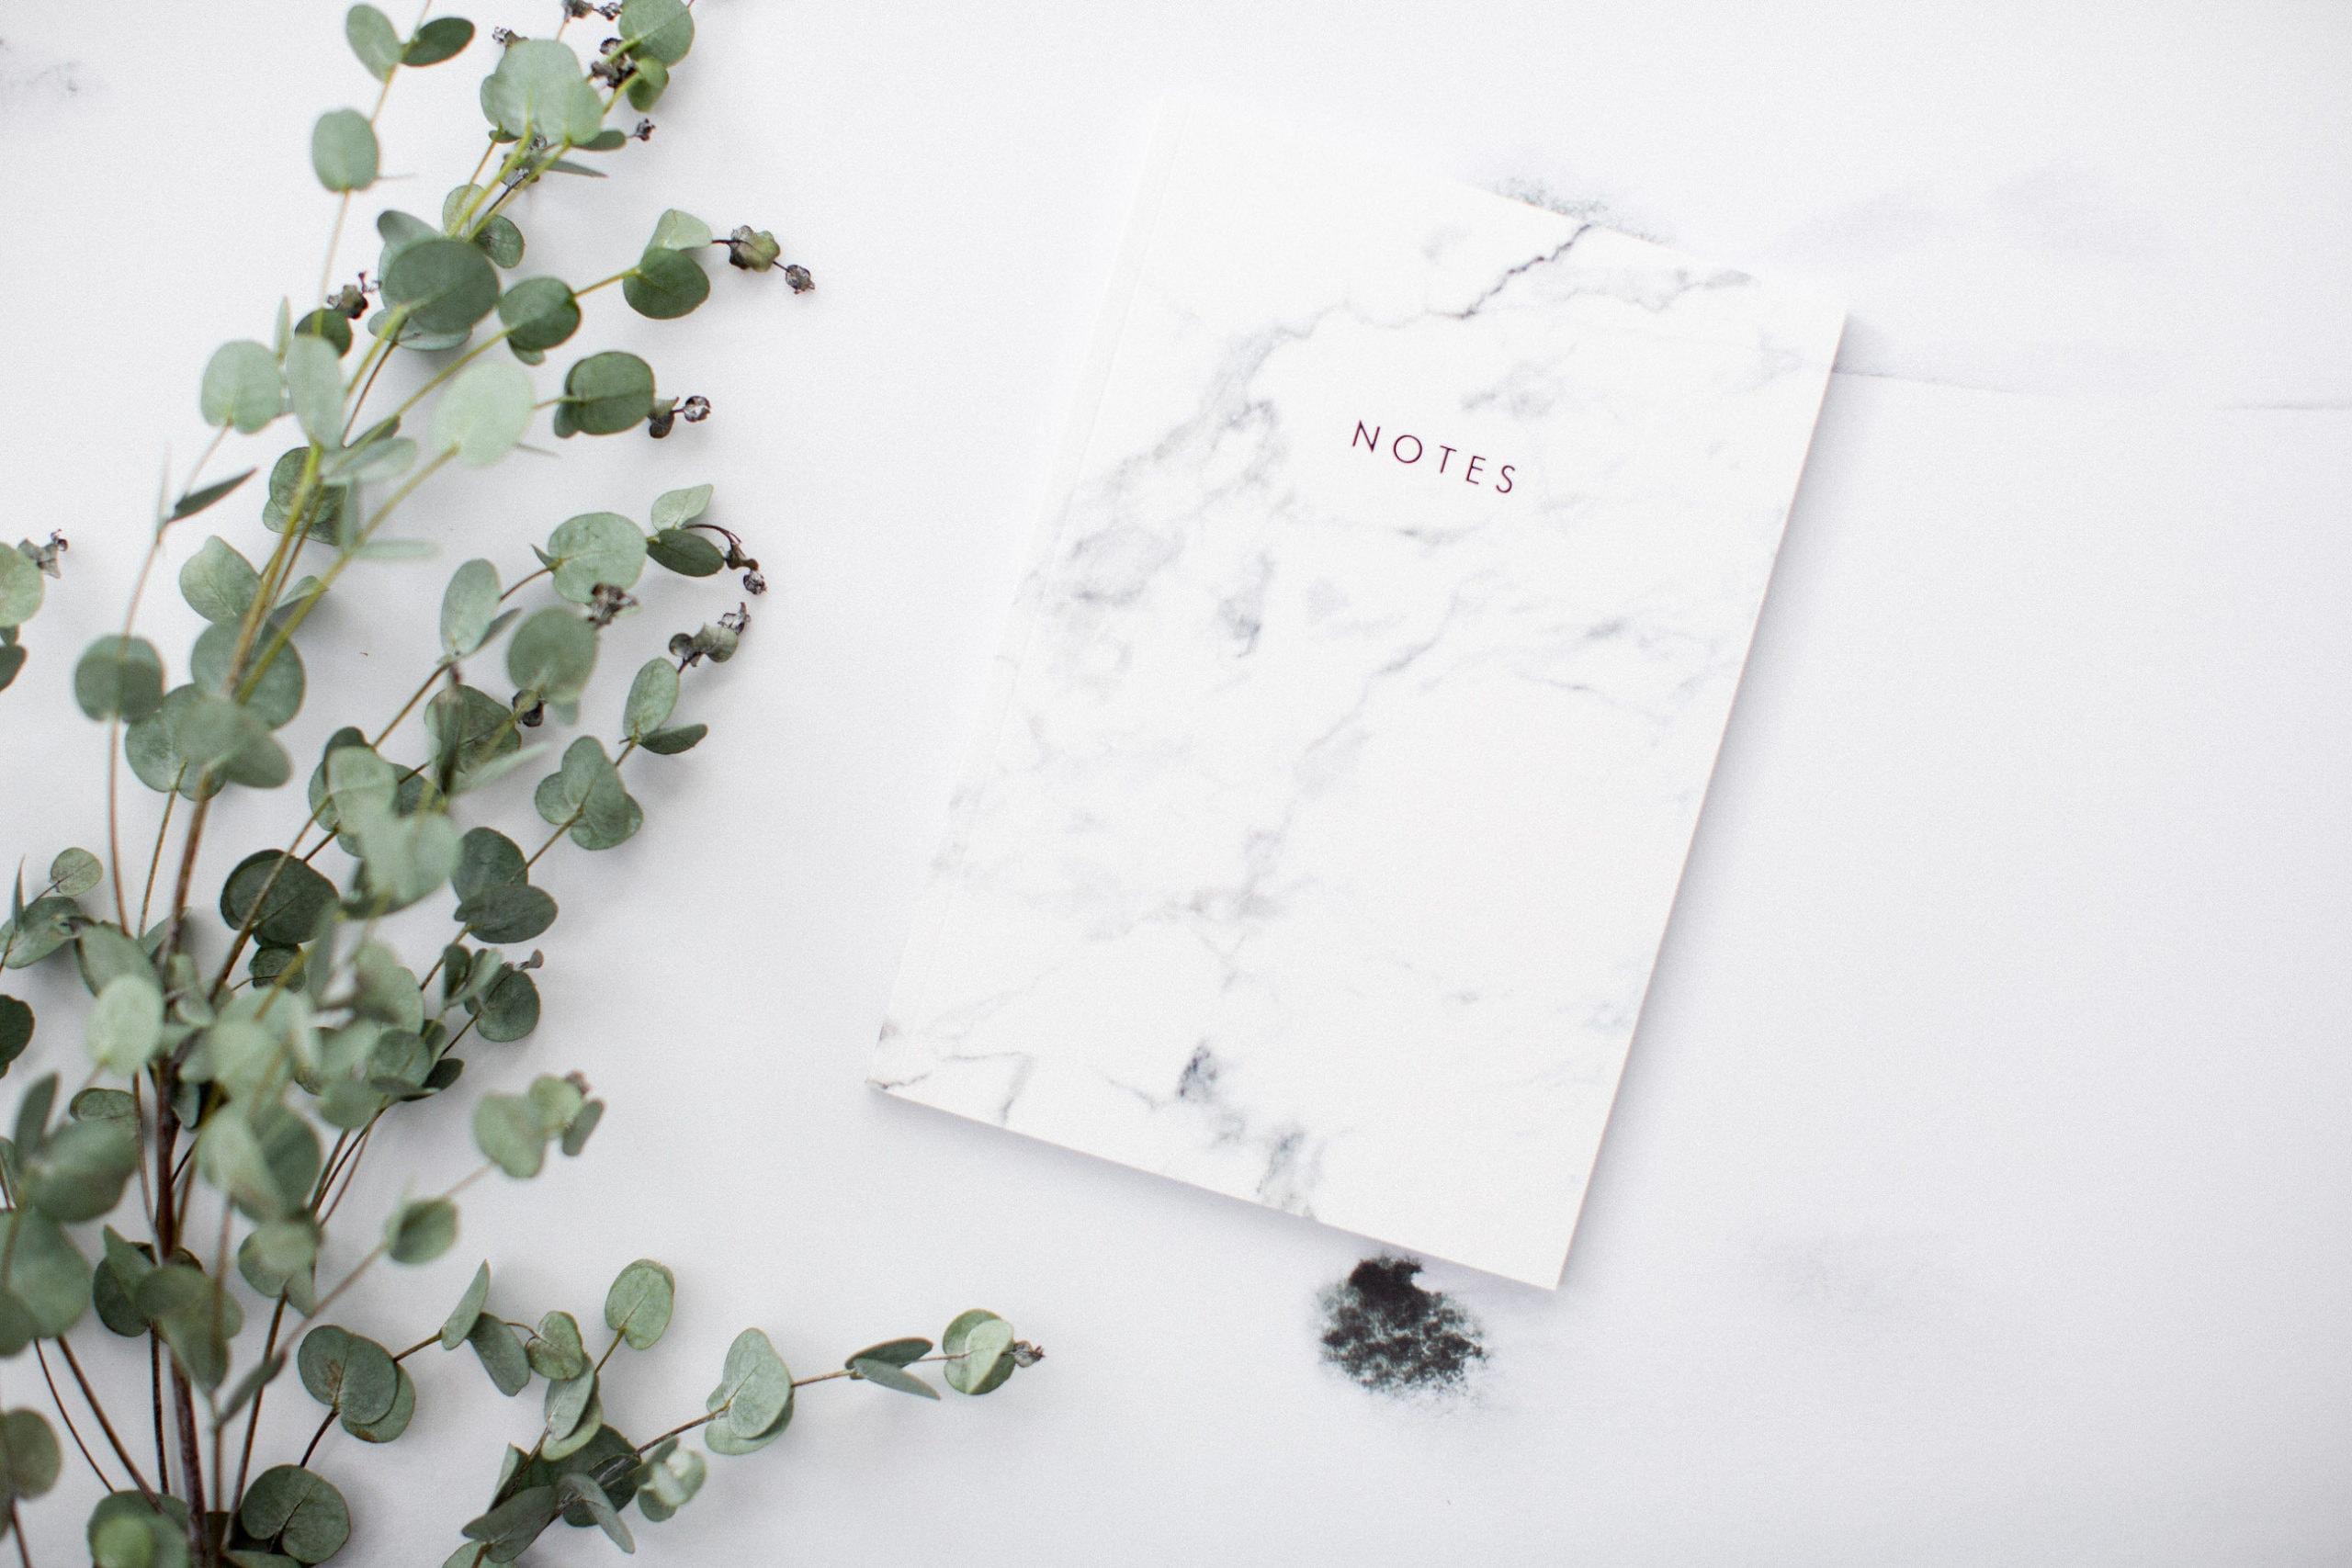 eucalyptus with notebook